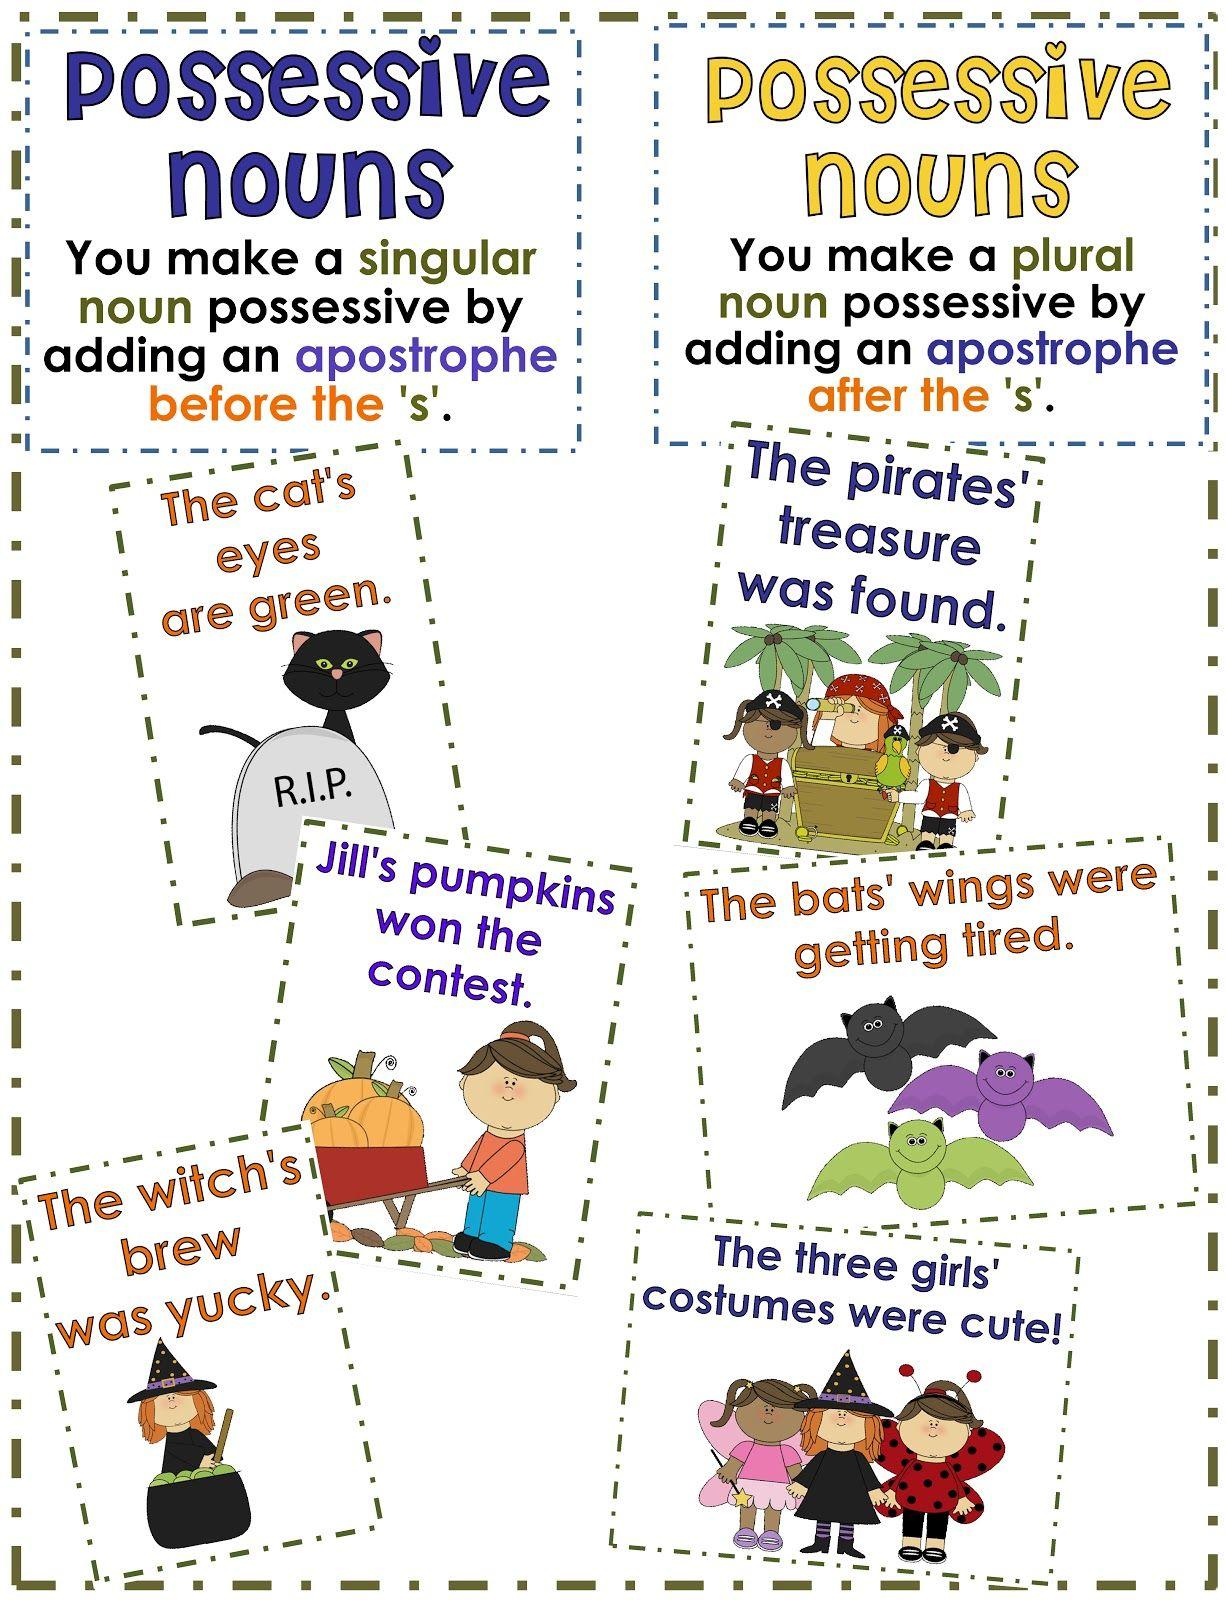 C2 Week 18 Possessive Nouns 2nd Grade Smarty Arties Taught